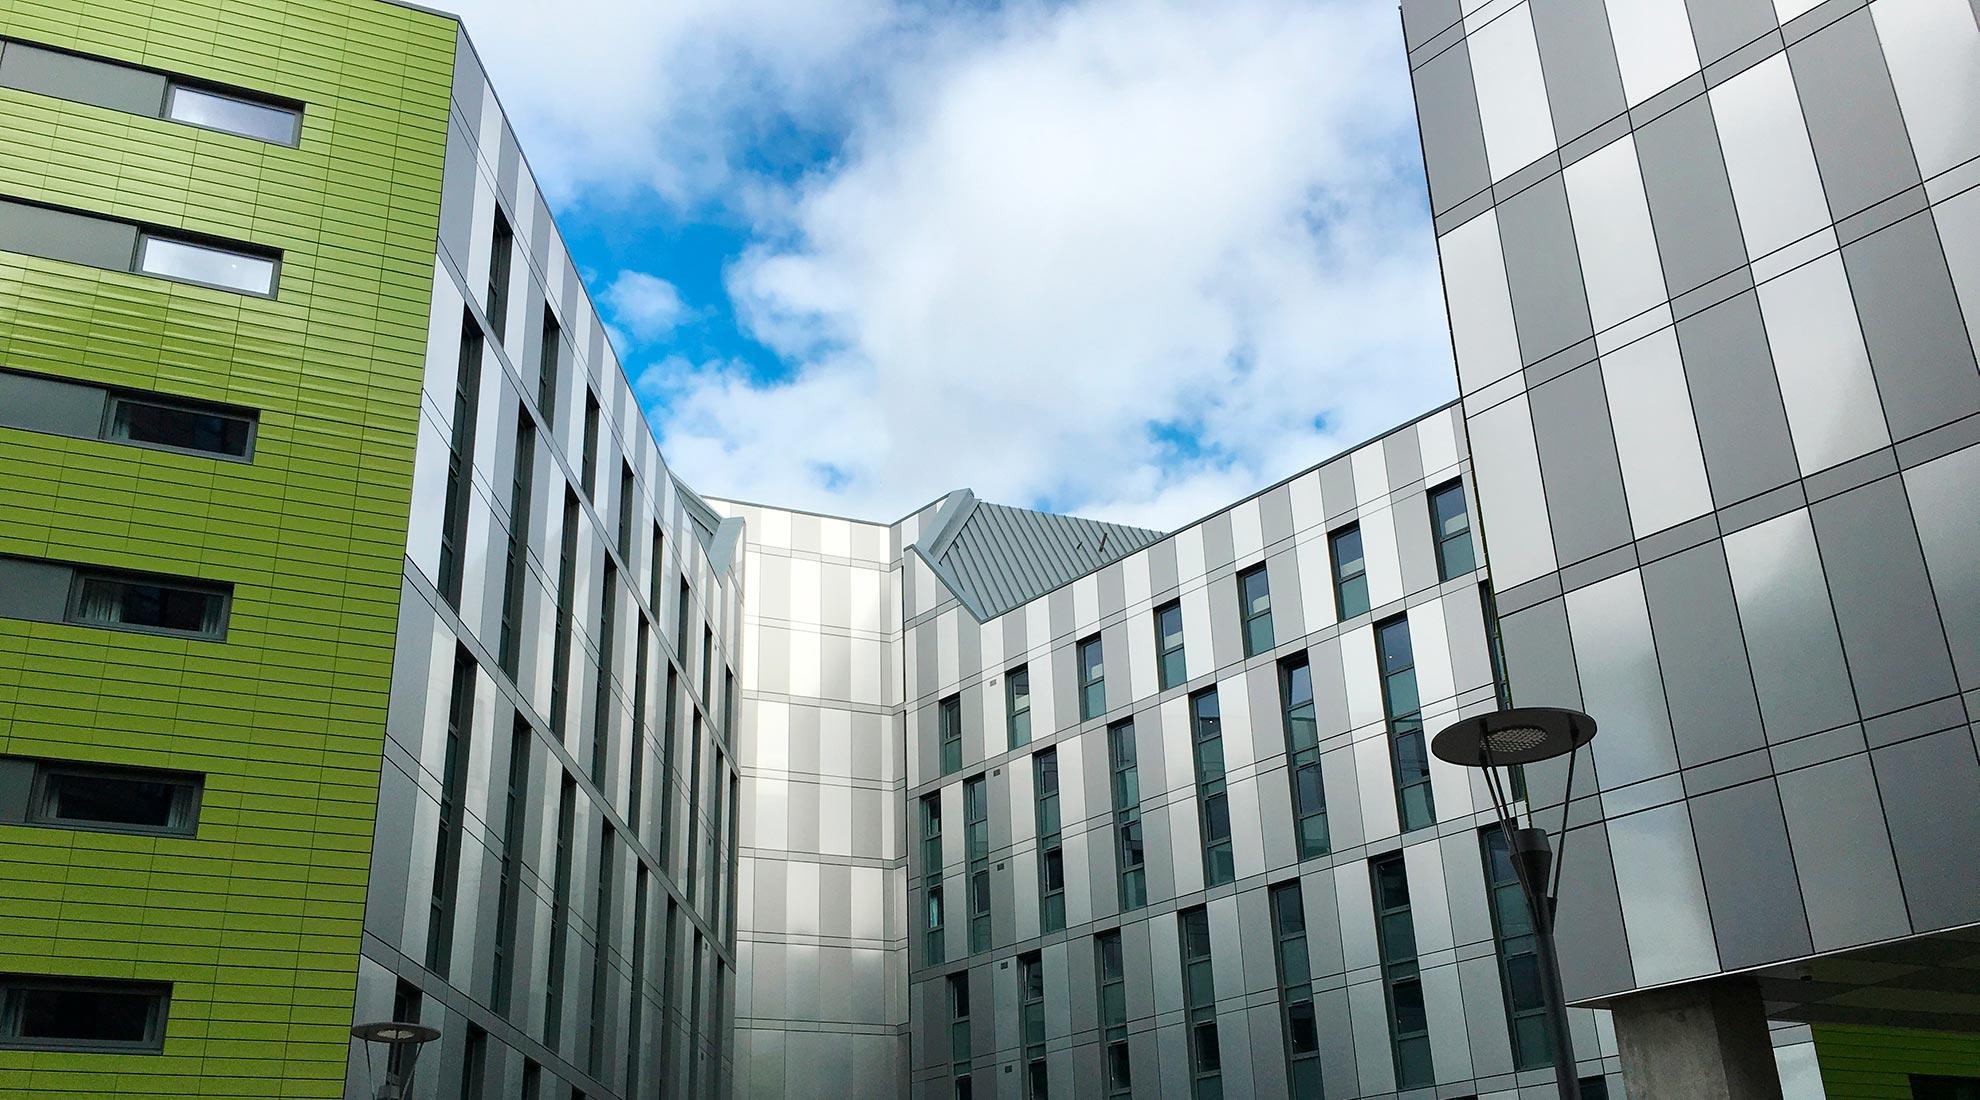 Hill-Court-Apartments-Newscastle-UK.-larson-Illusions-ANODIC-MATT--1_1592407701.jpg